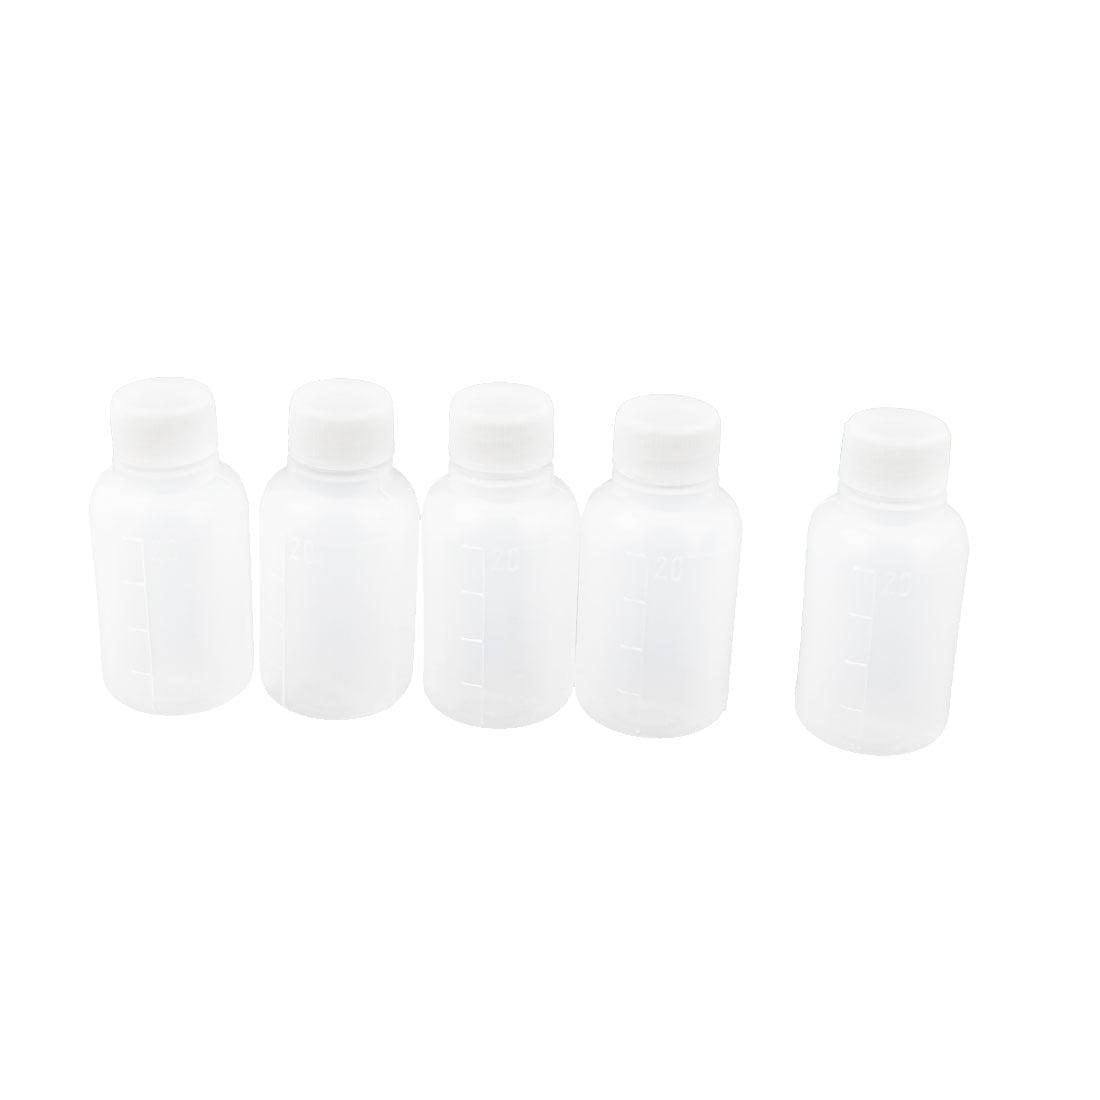 5 Pcs 20ML White Mini Travel Empty Plastic Alcohol Liquor Bottle by